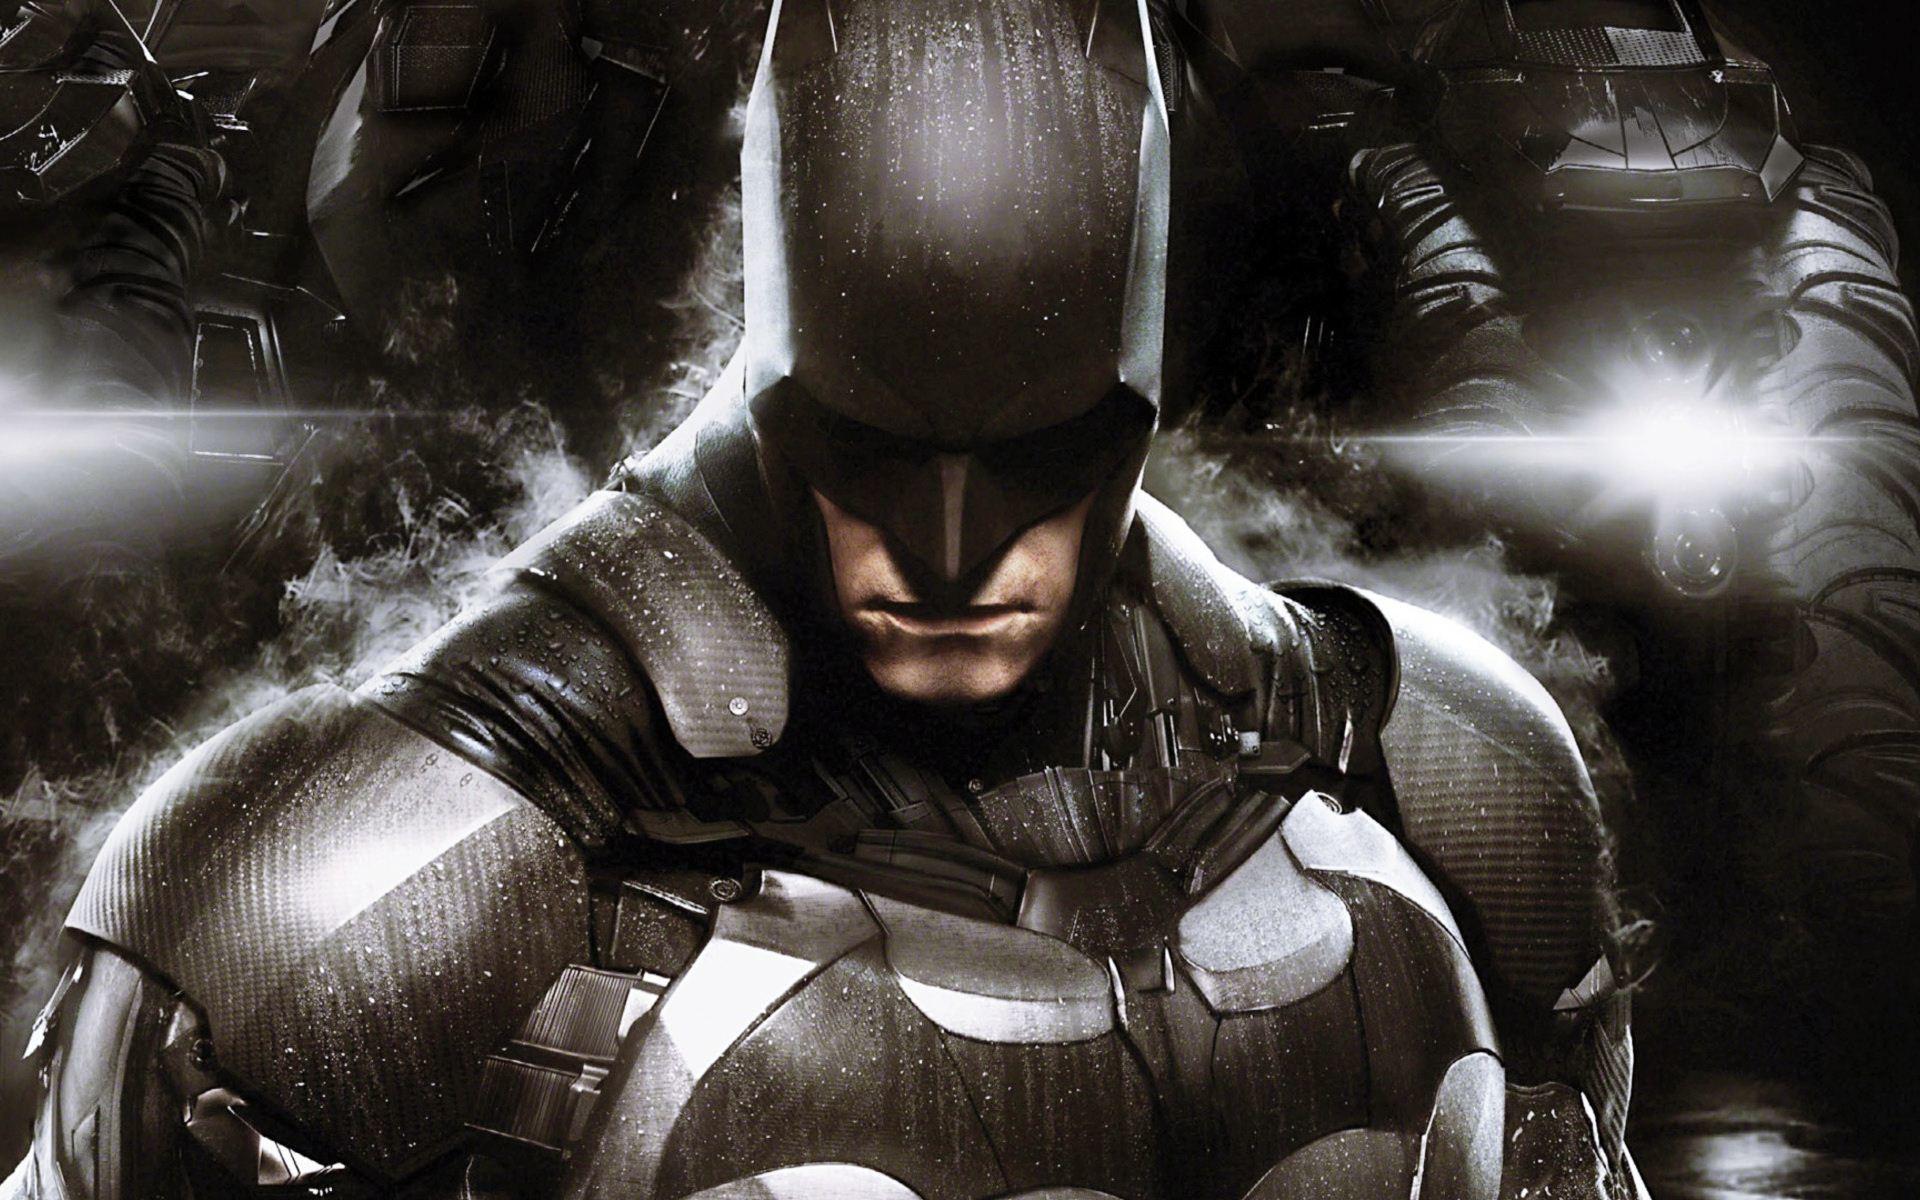 Batman Arkham Knight K Wallpaper   Wallpapers 4k   Pinterest   Batman  arkham knight, Batman arkham and Arkham knight